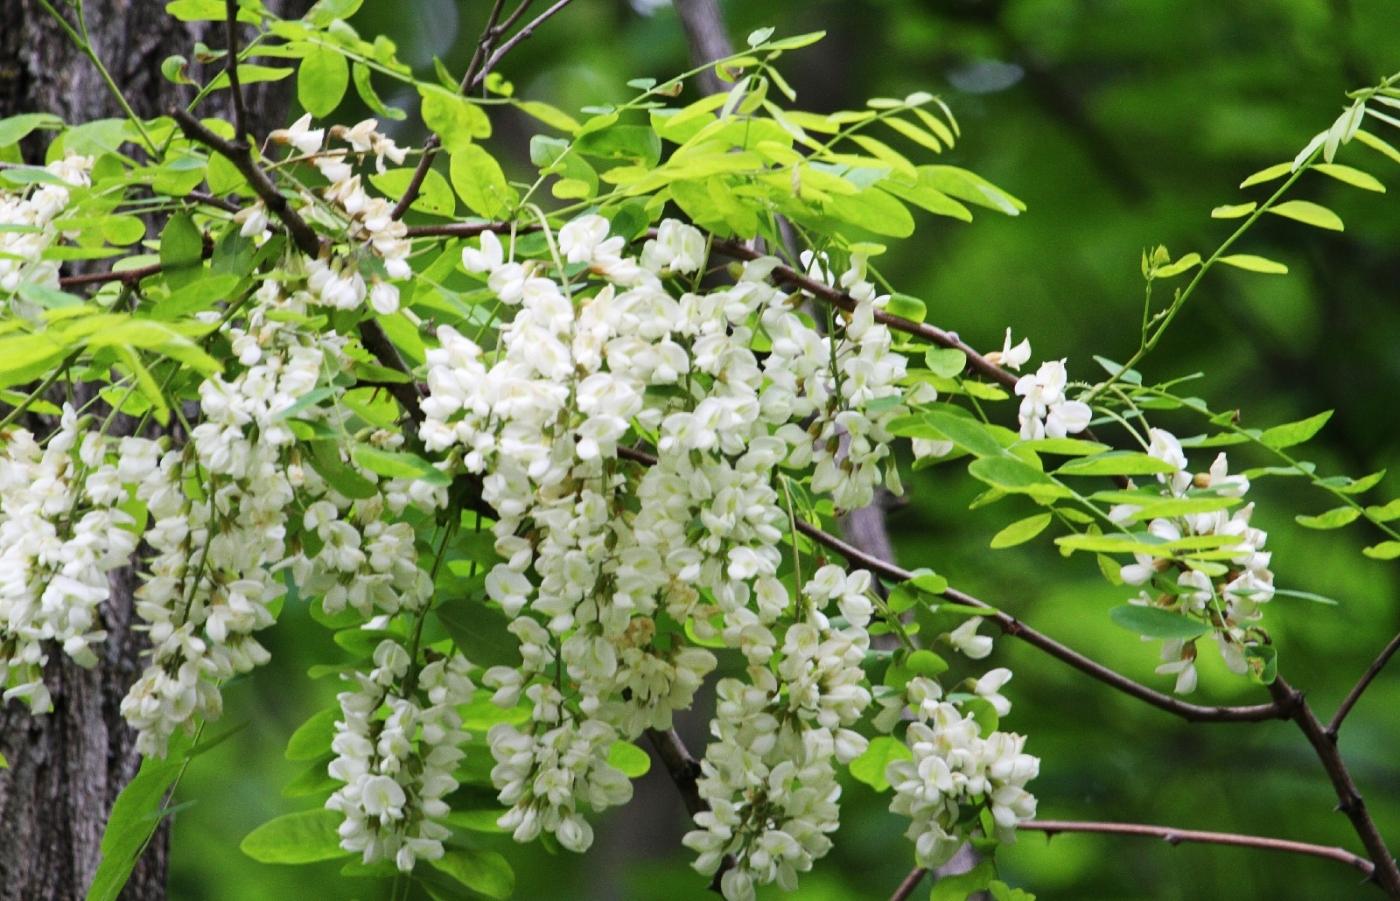 【田螺随拍】美国黄杨american yellowwood_图1-2